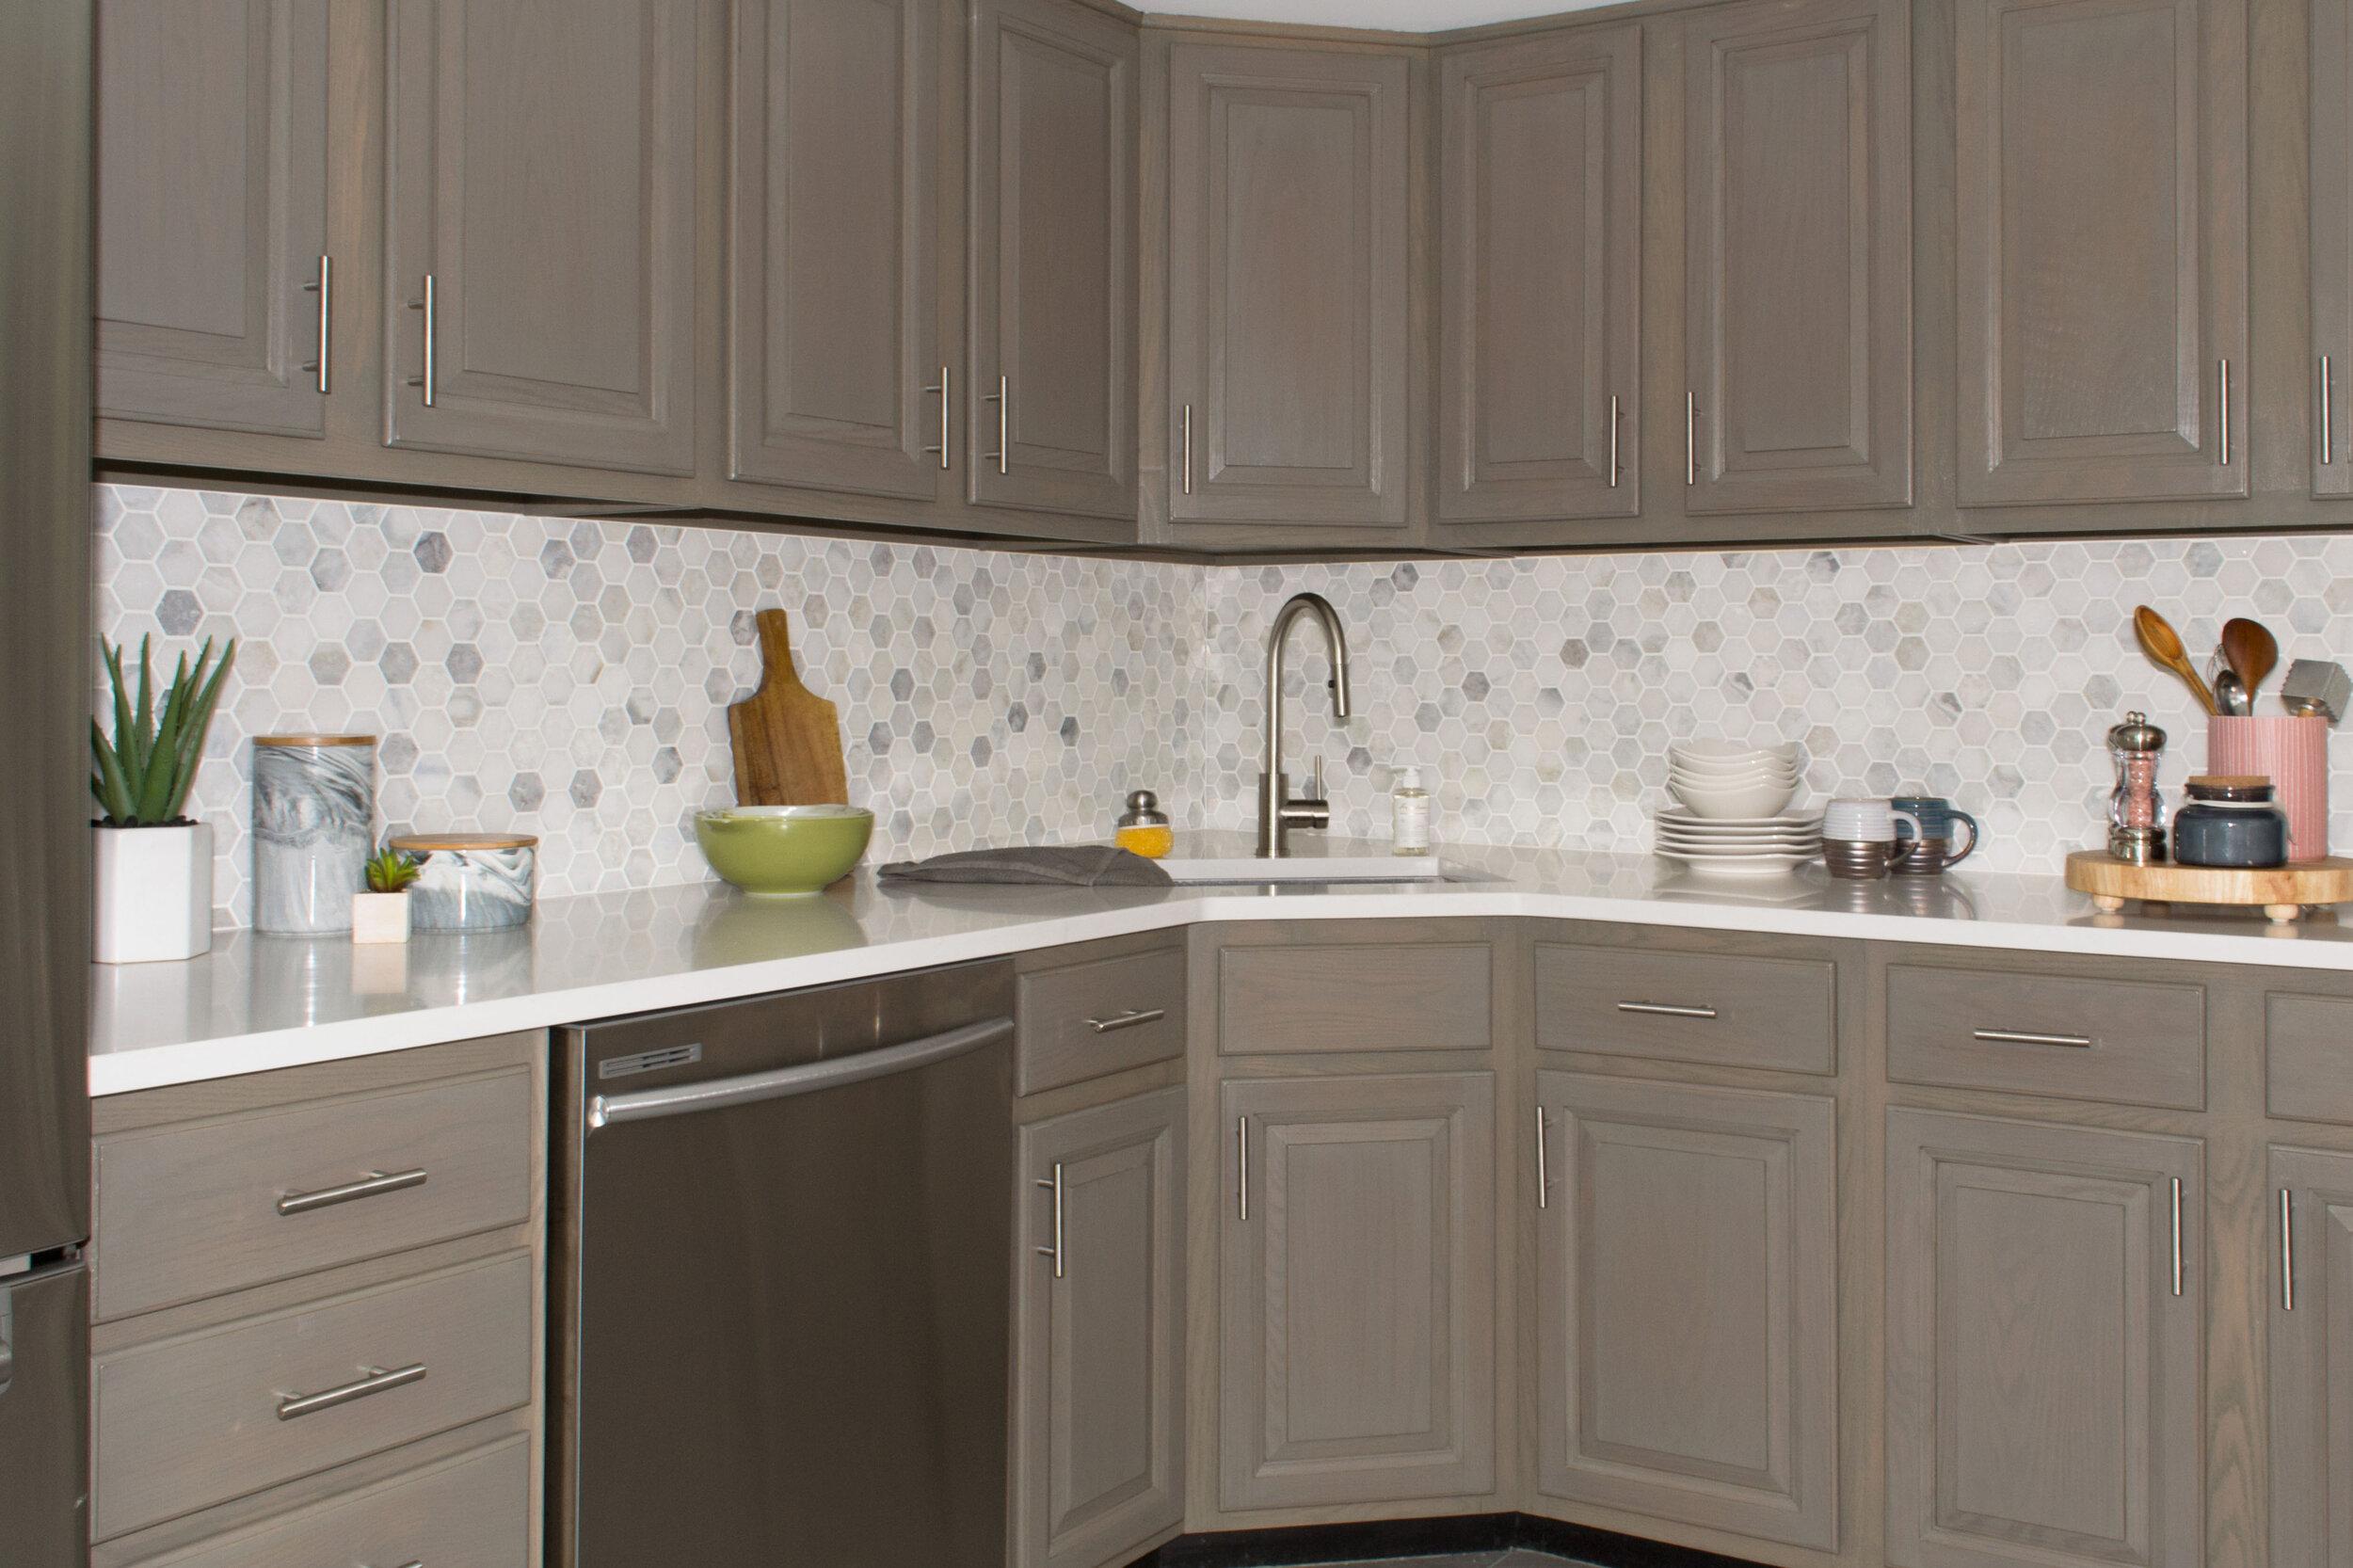 kitchen-backsplash-tc-interiors-2.jpg